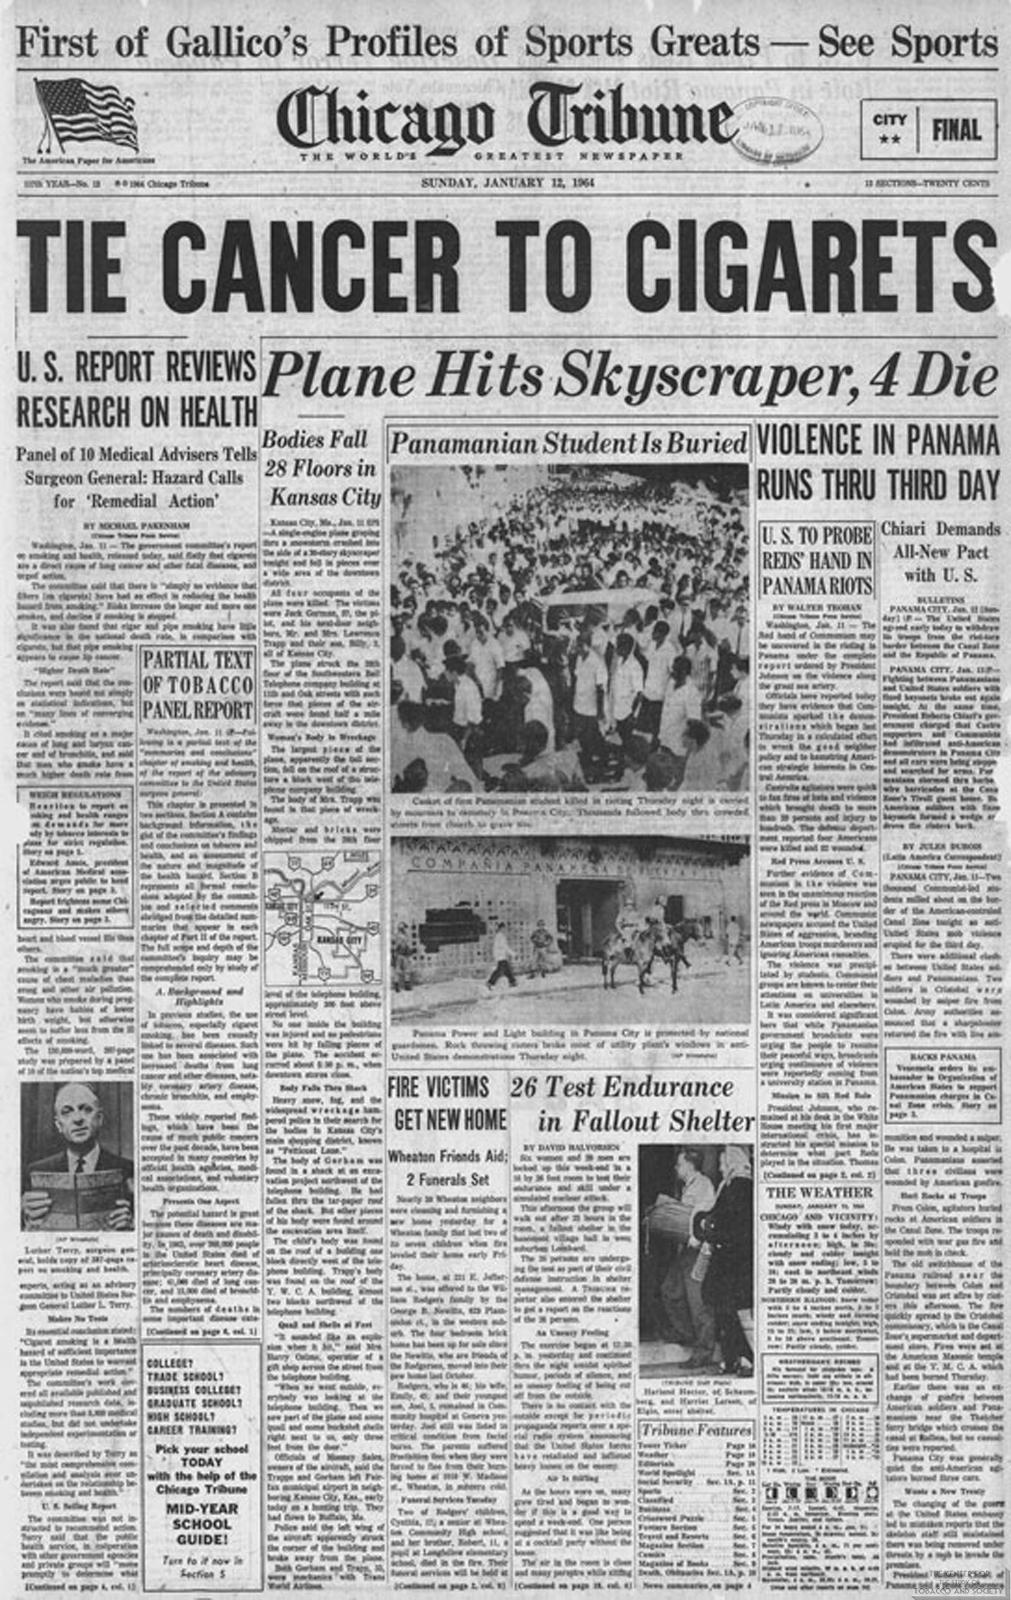 1964 01 12 Chicago Tribune Tie Cancer to Cigs